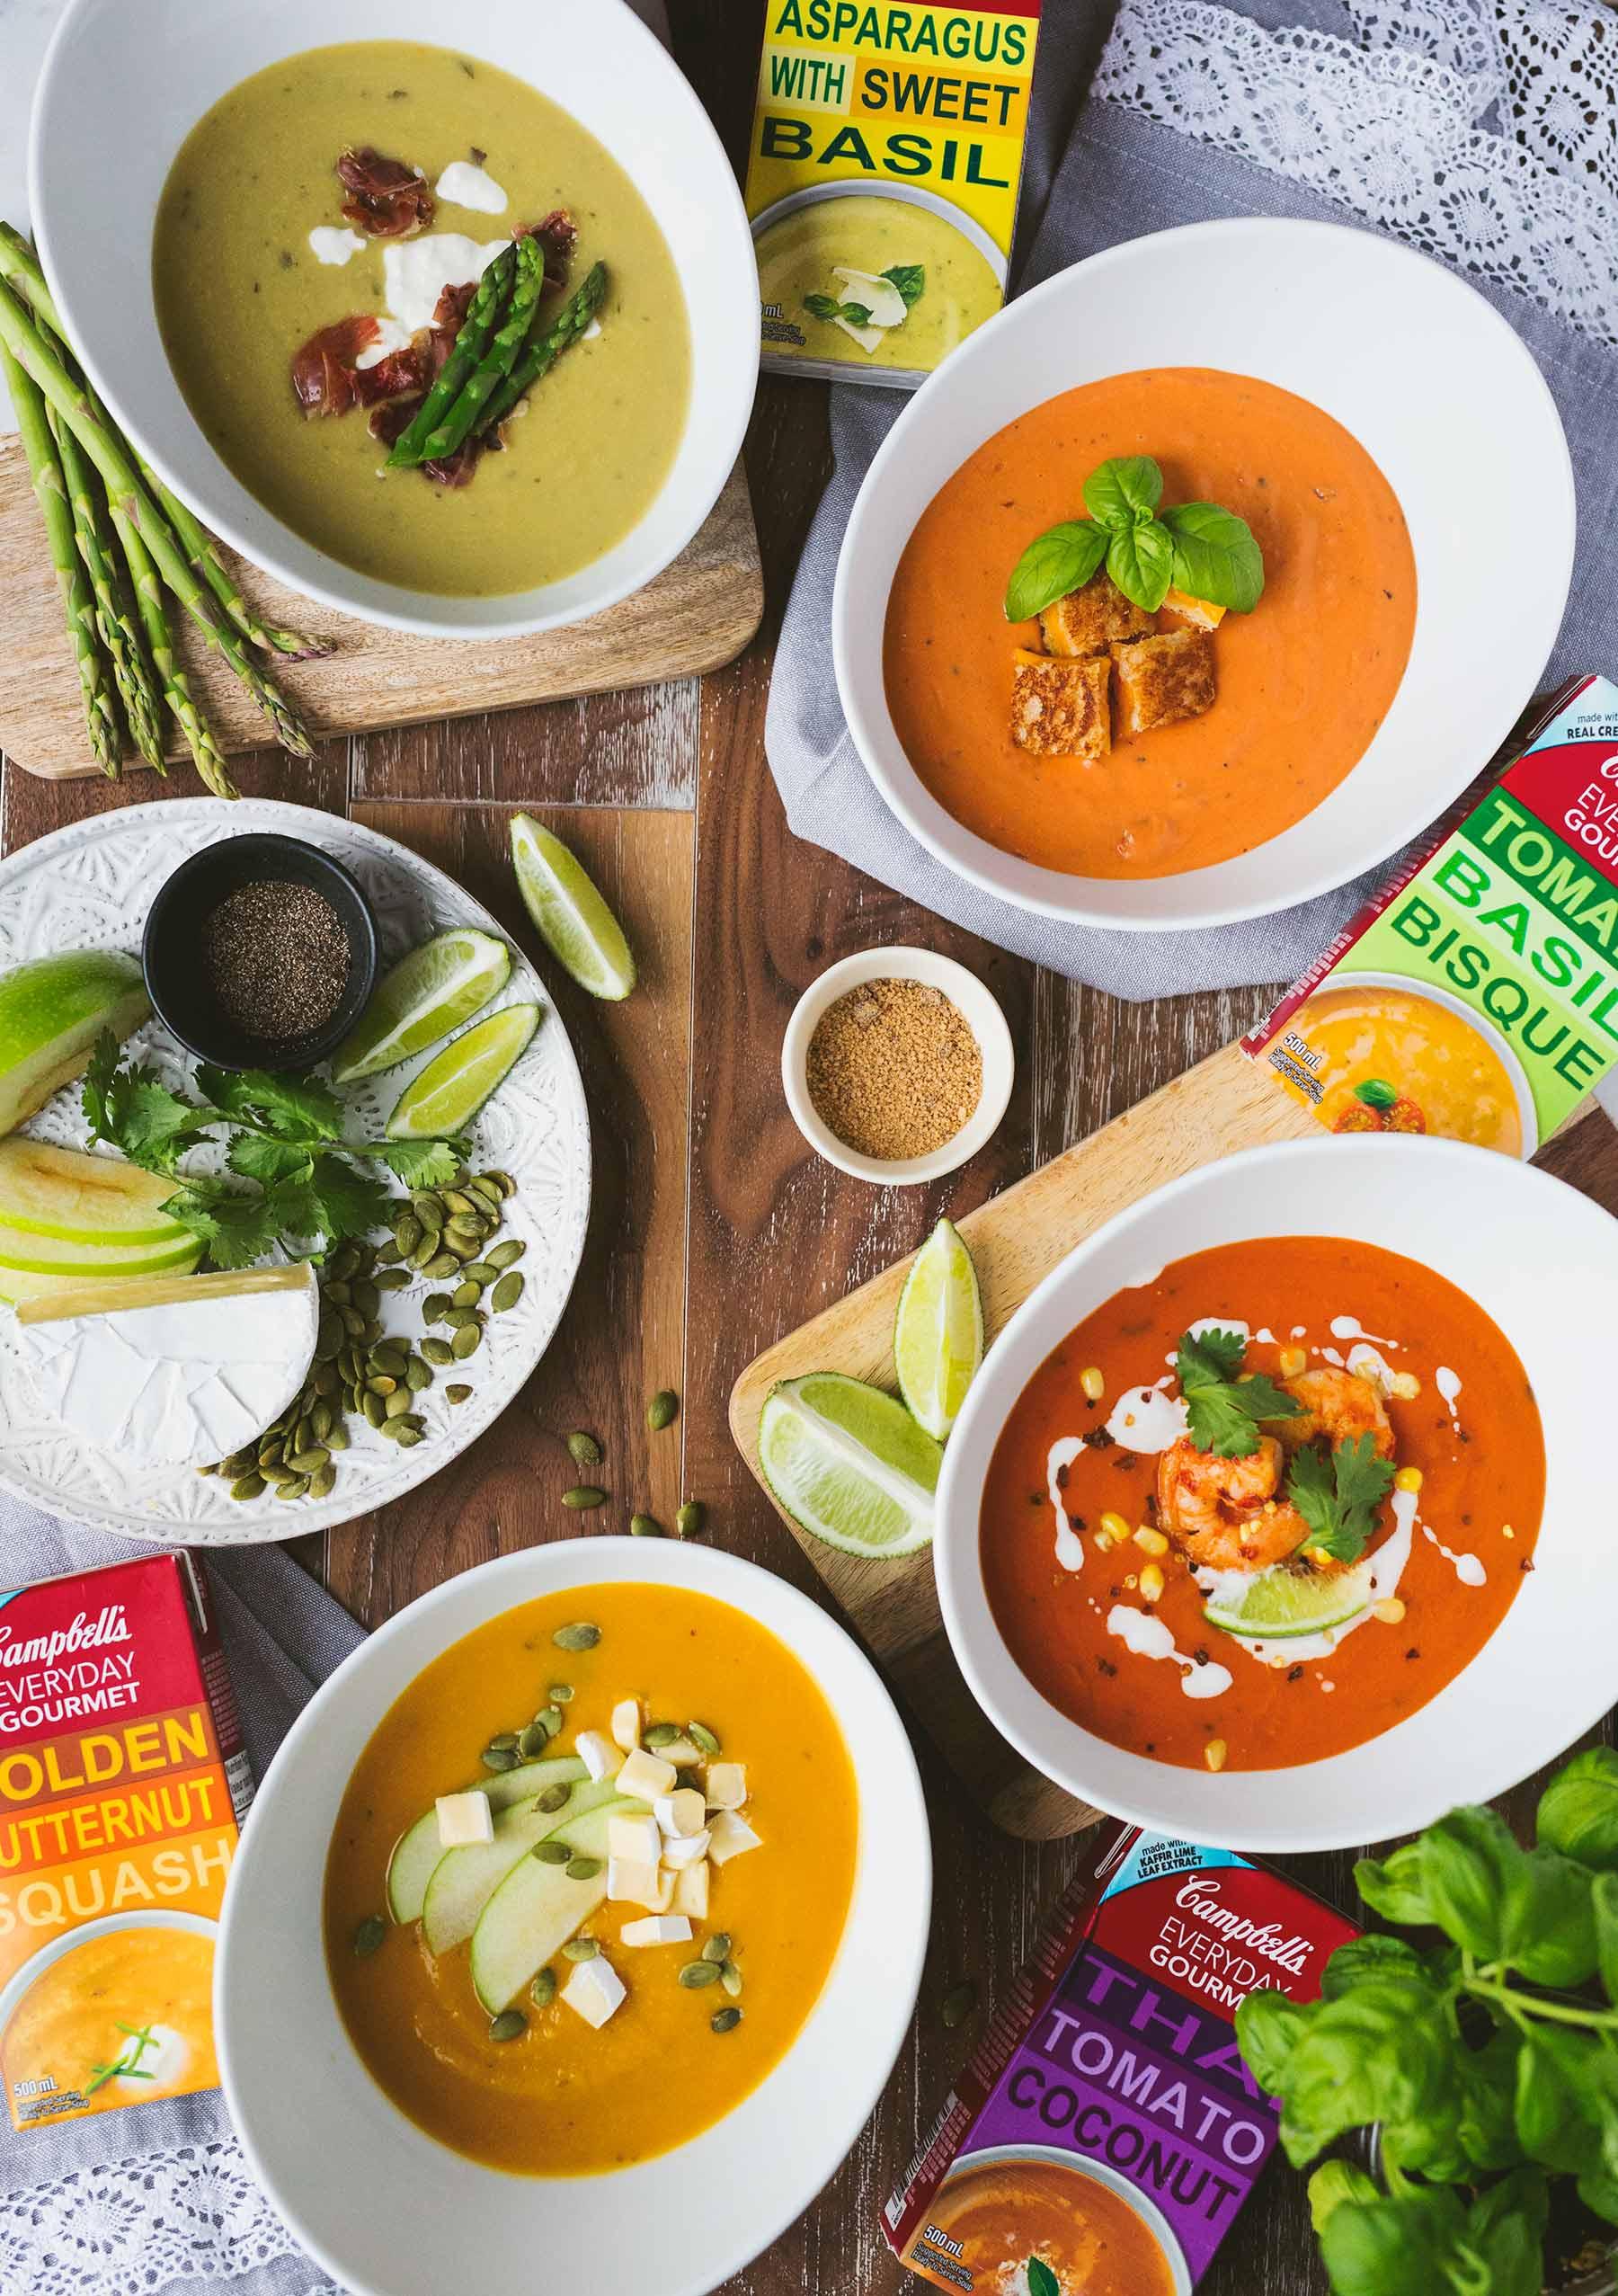 Campbell's Everyday Gourmet Soup Cartons